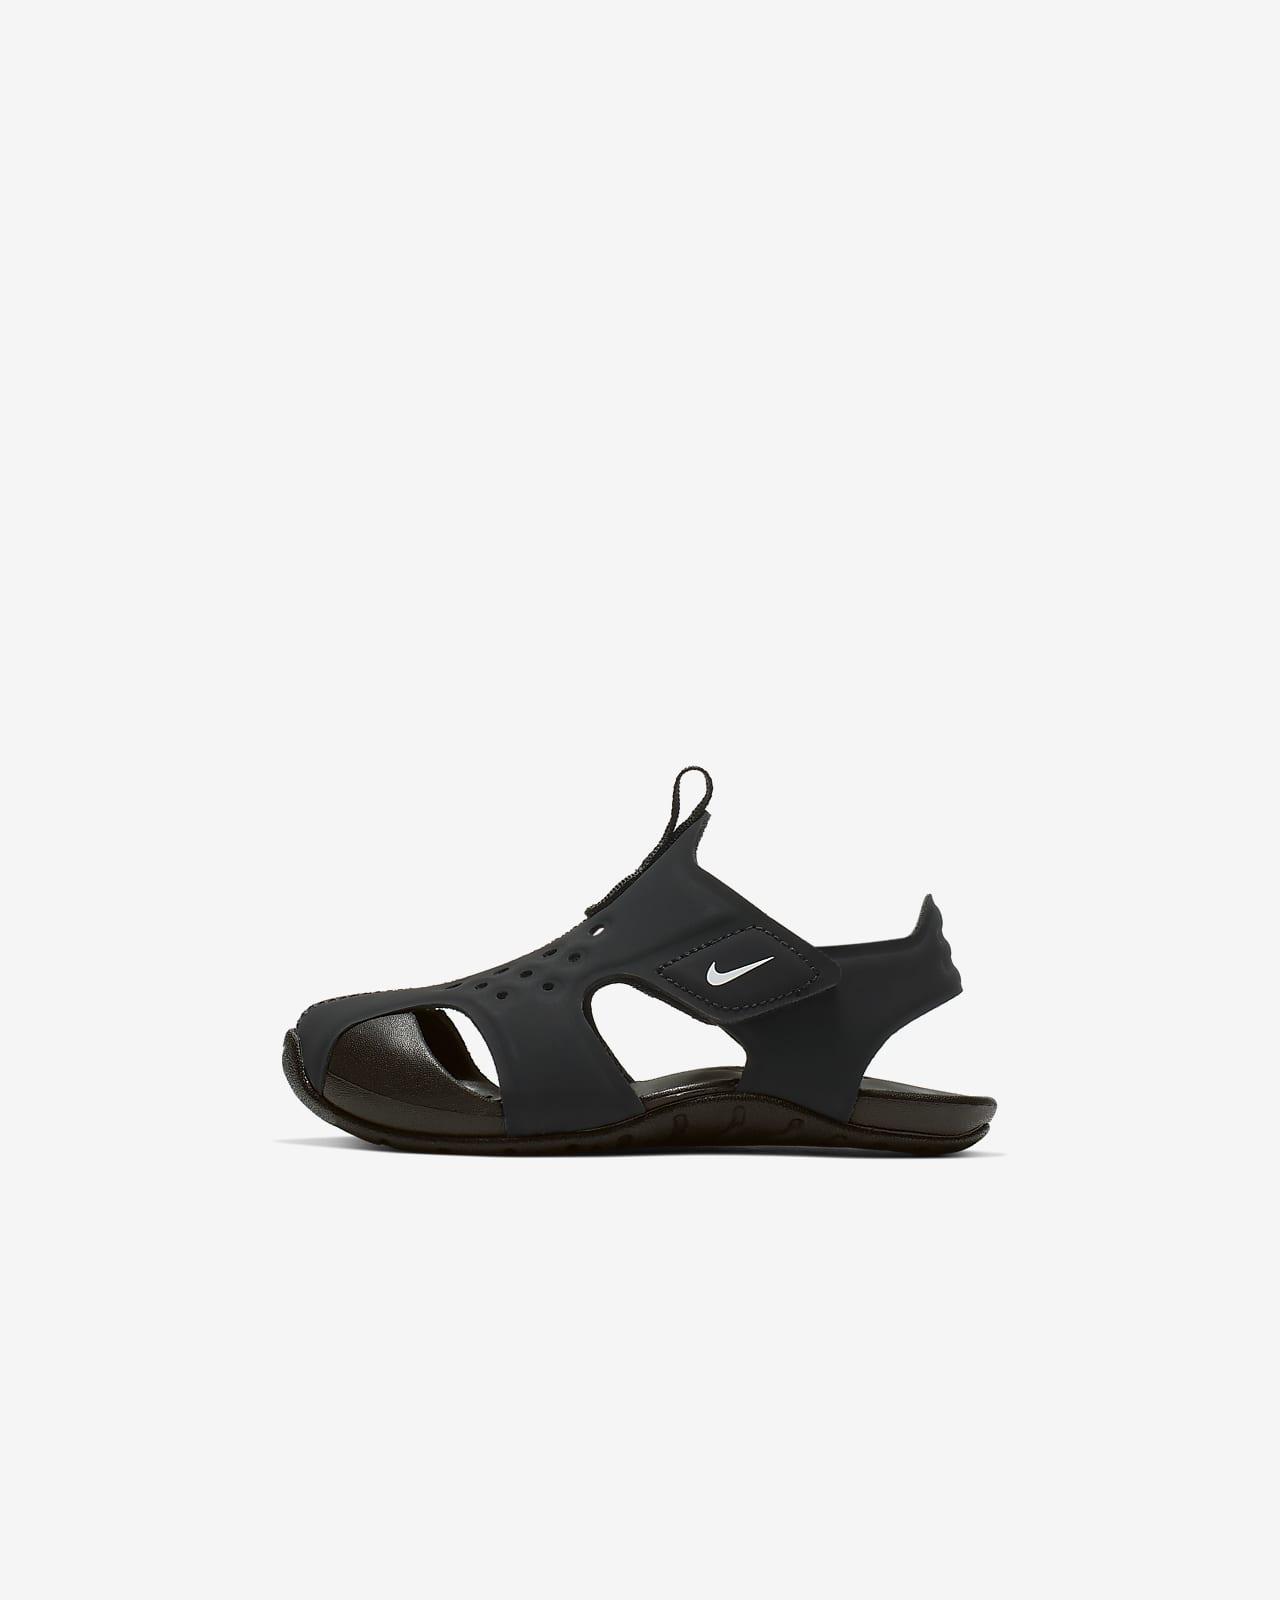 Sandalias para bebé e infantil Nike Sunray Protect 2